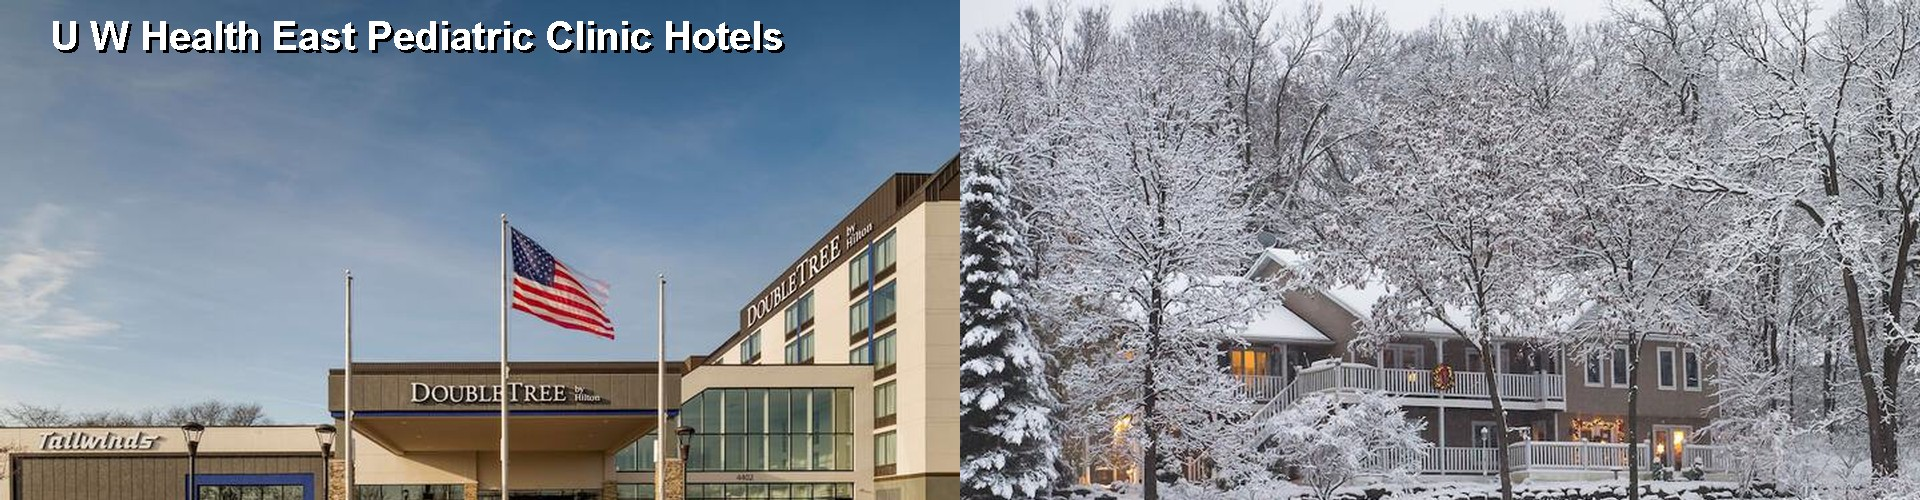 5 Best Hotels Near U W Health East Pediatric Clinic